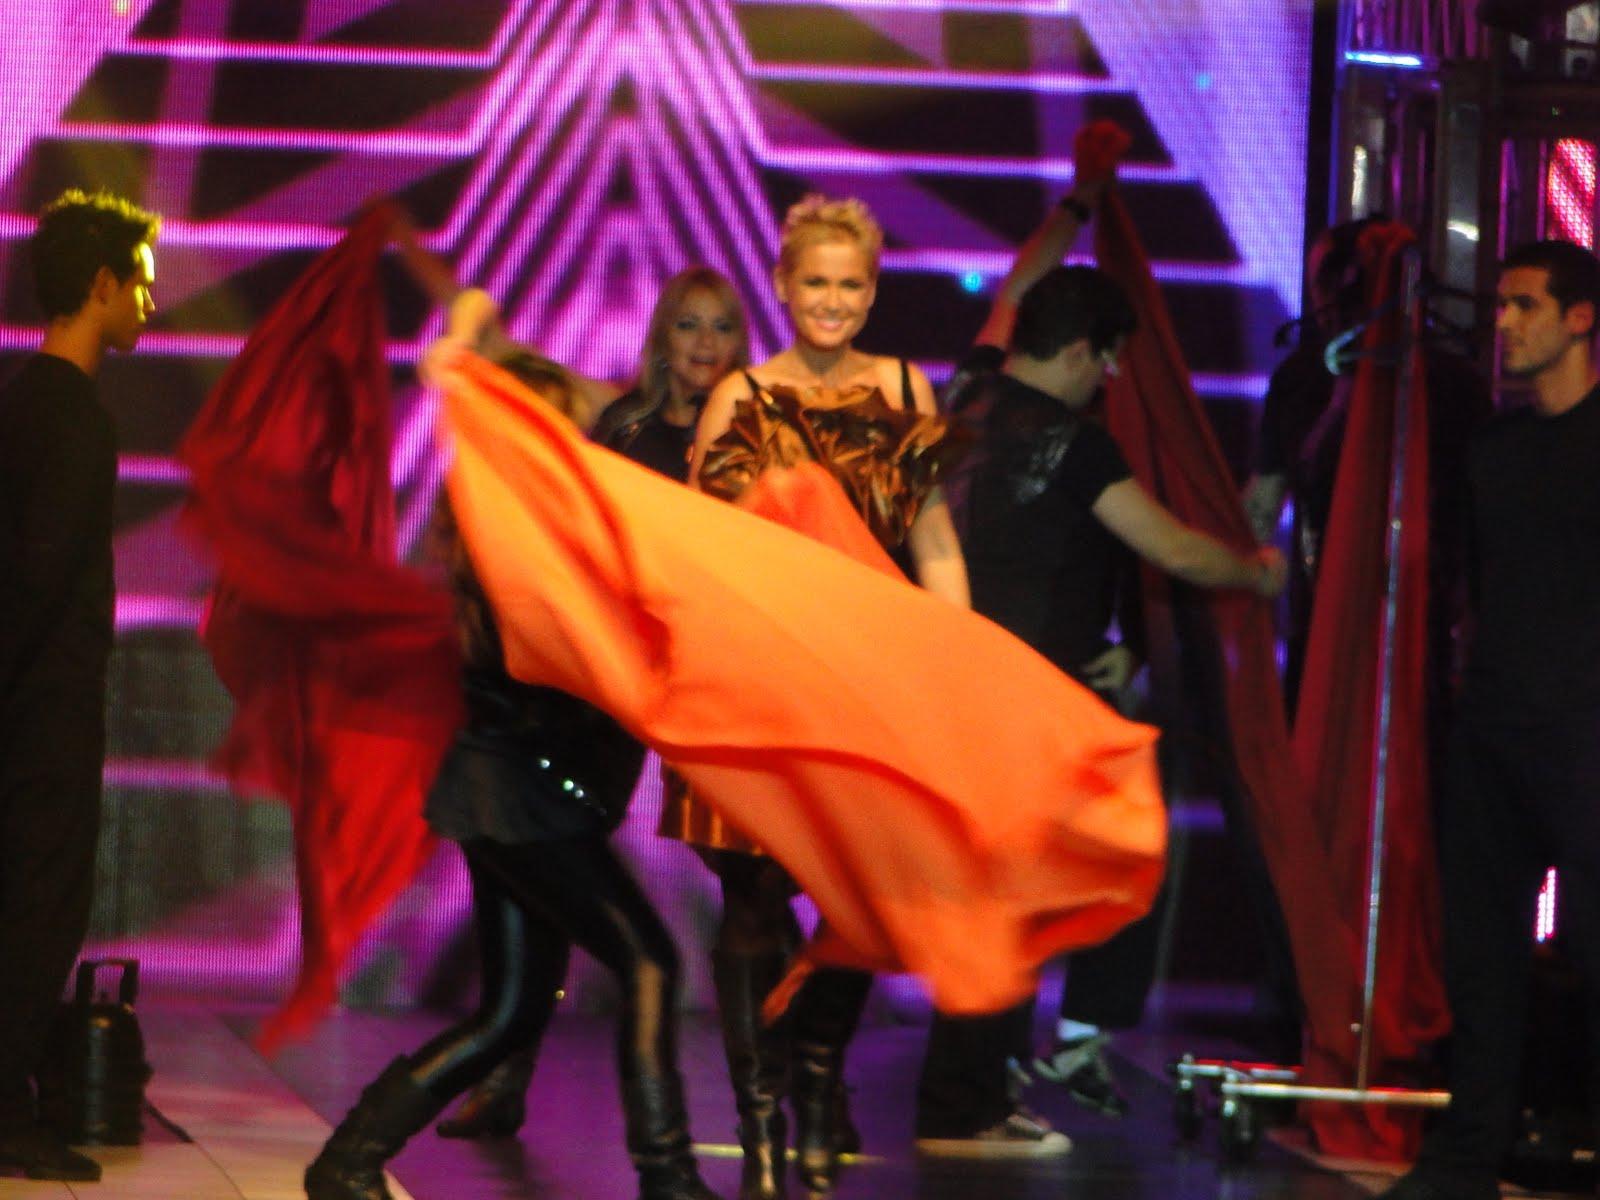 Contexto Fashion: MONANGE DREAM FASHION TOUR EM BH